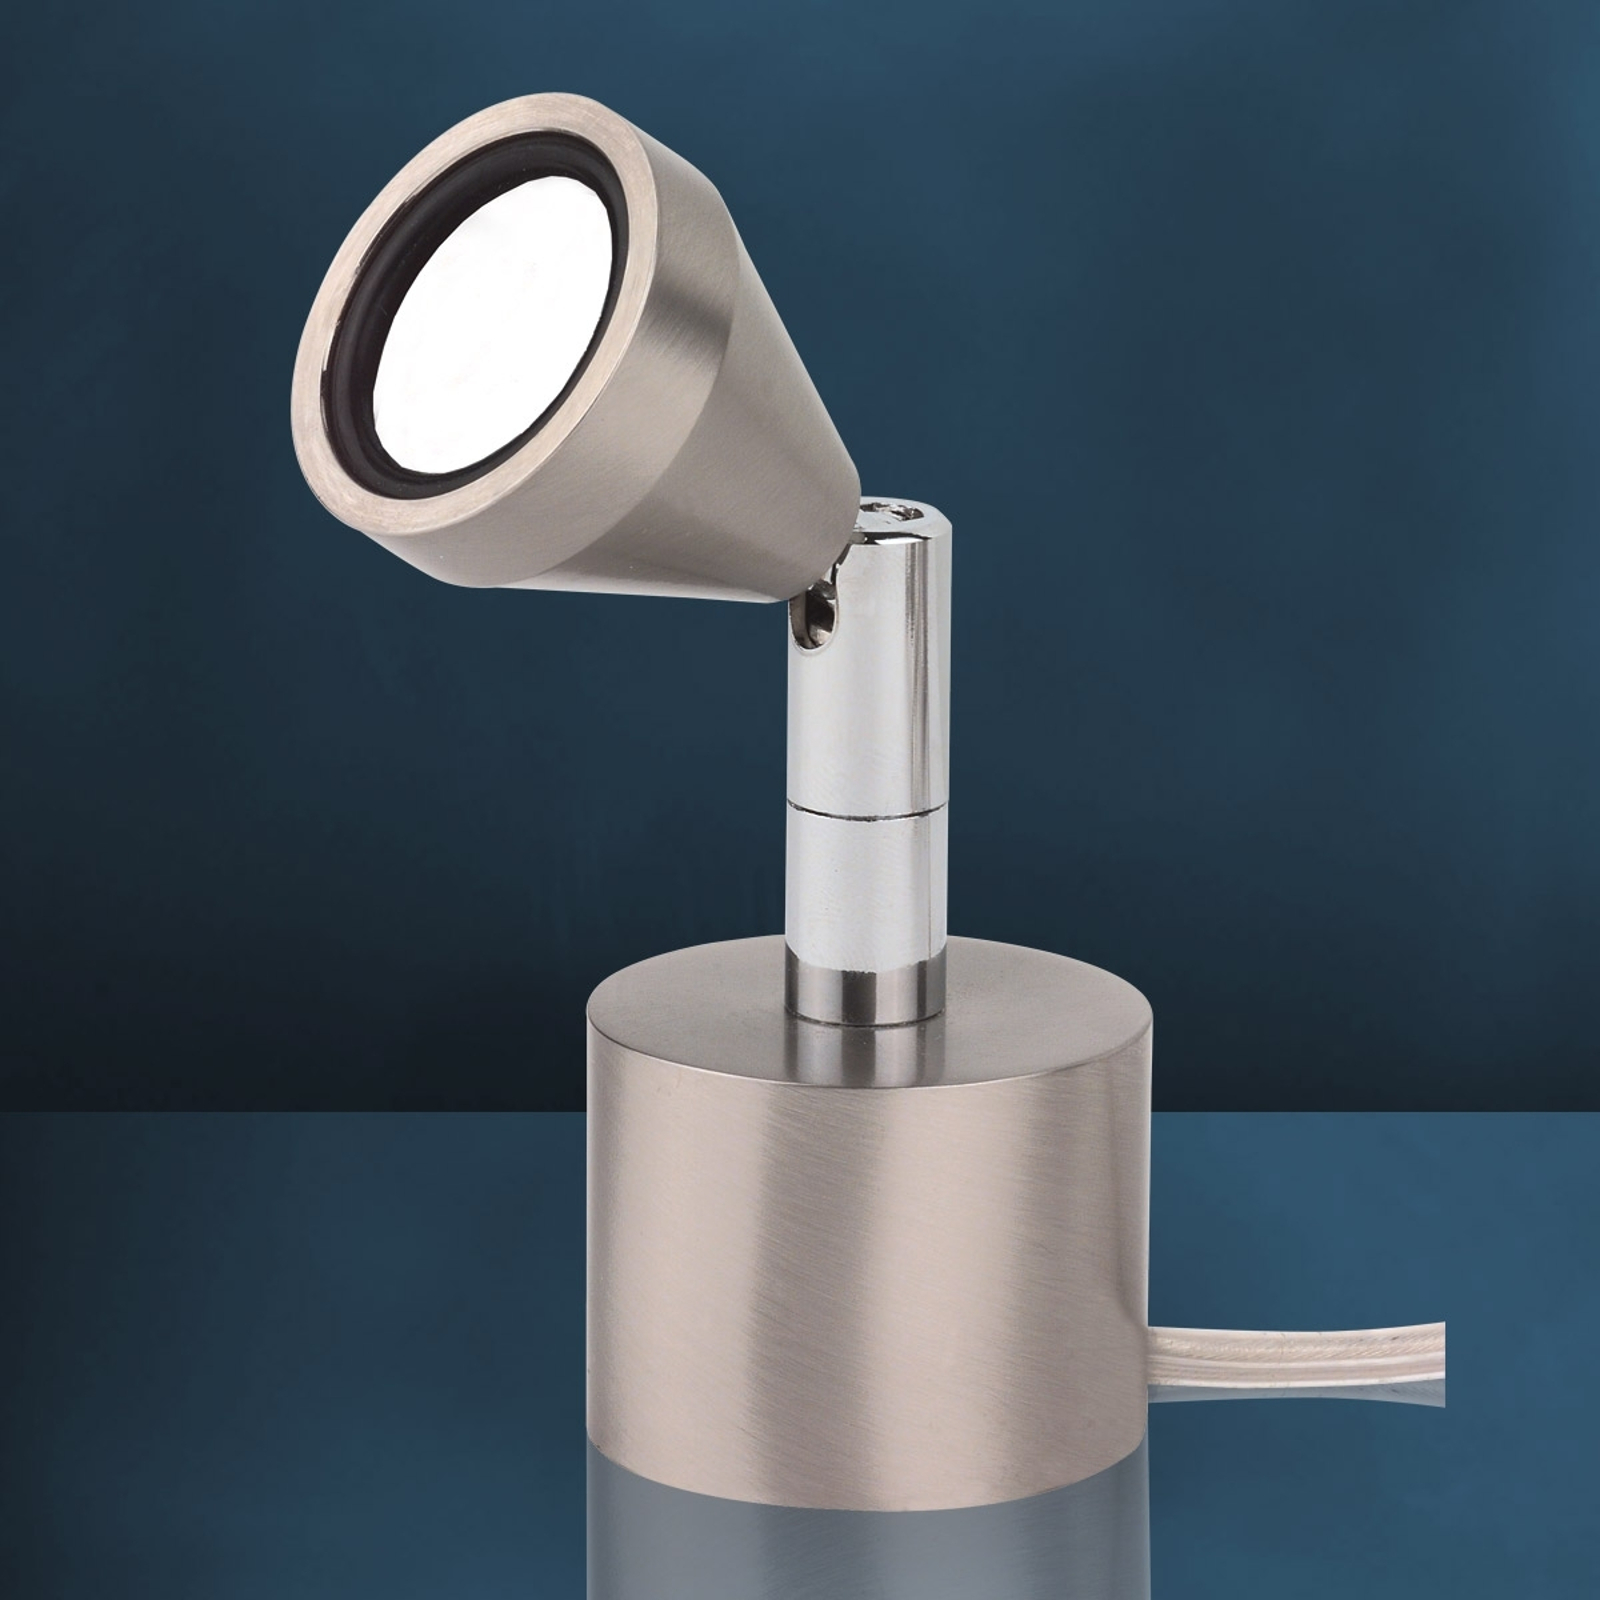 Lámpara de mesa LED MINI, blanco cálido